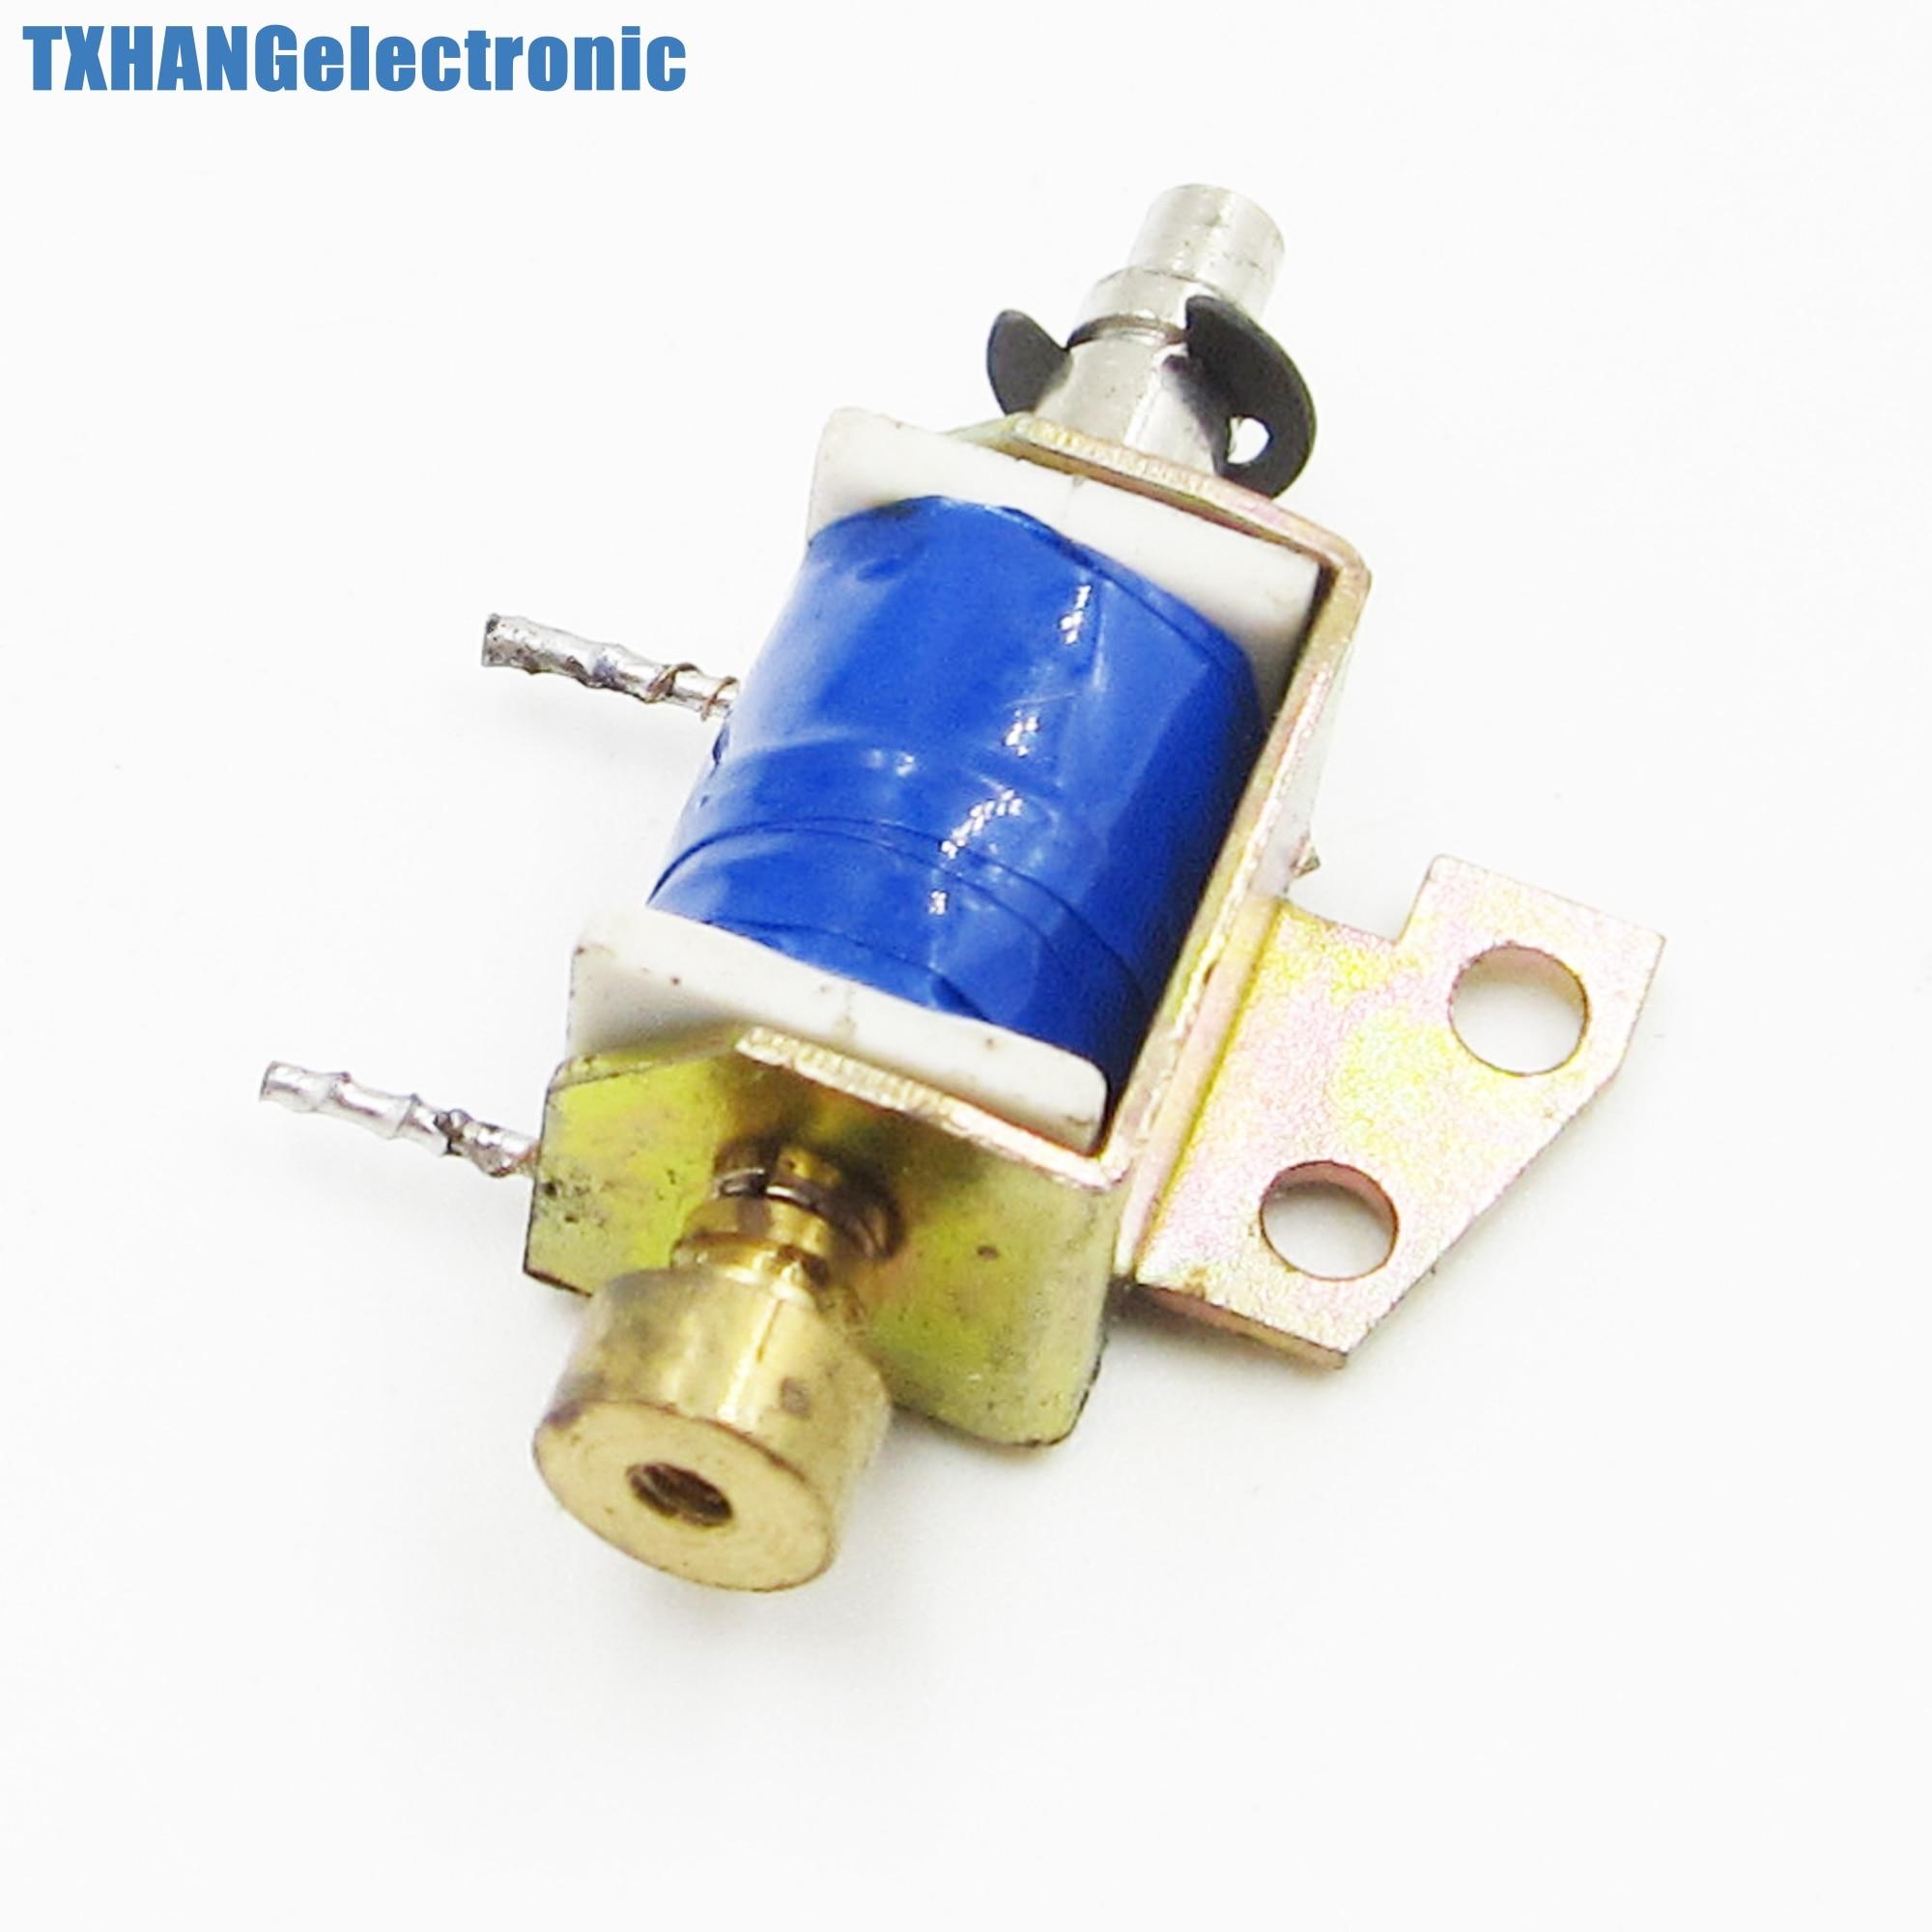 HCNE1-0416 DC12V electroimán solenoide tipo push pull marco abierto 10mm 2N reinicio